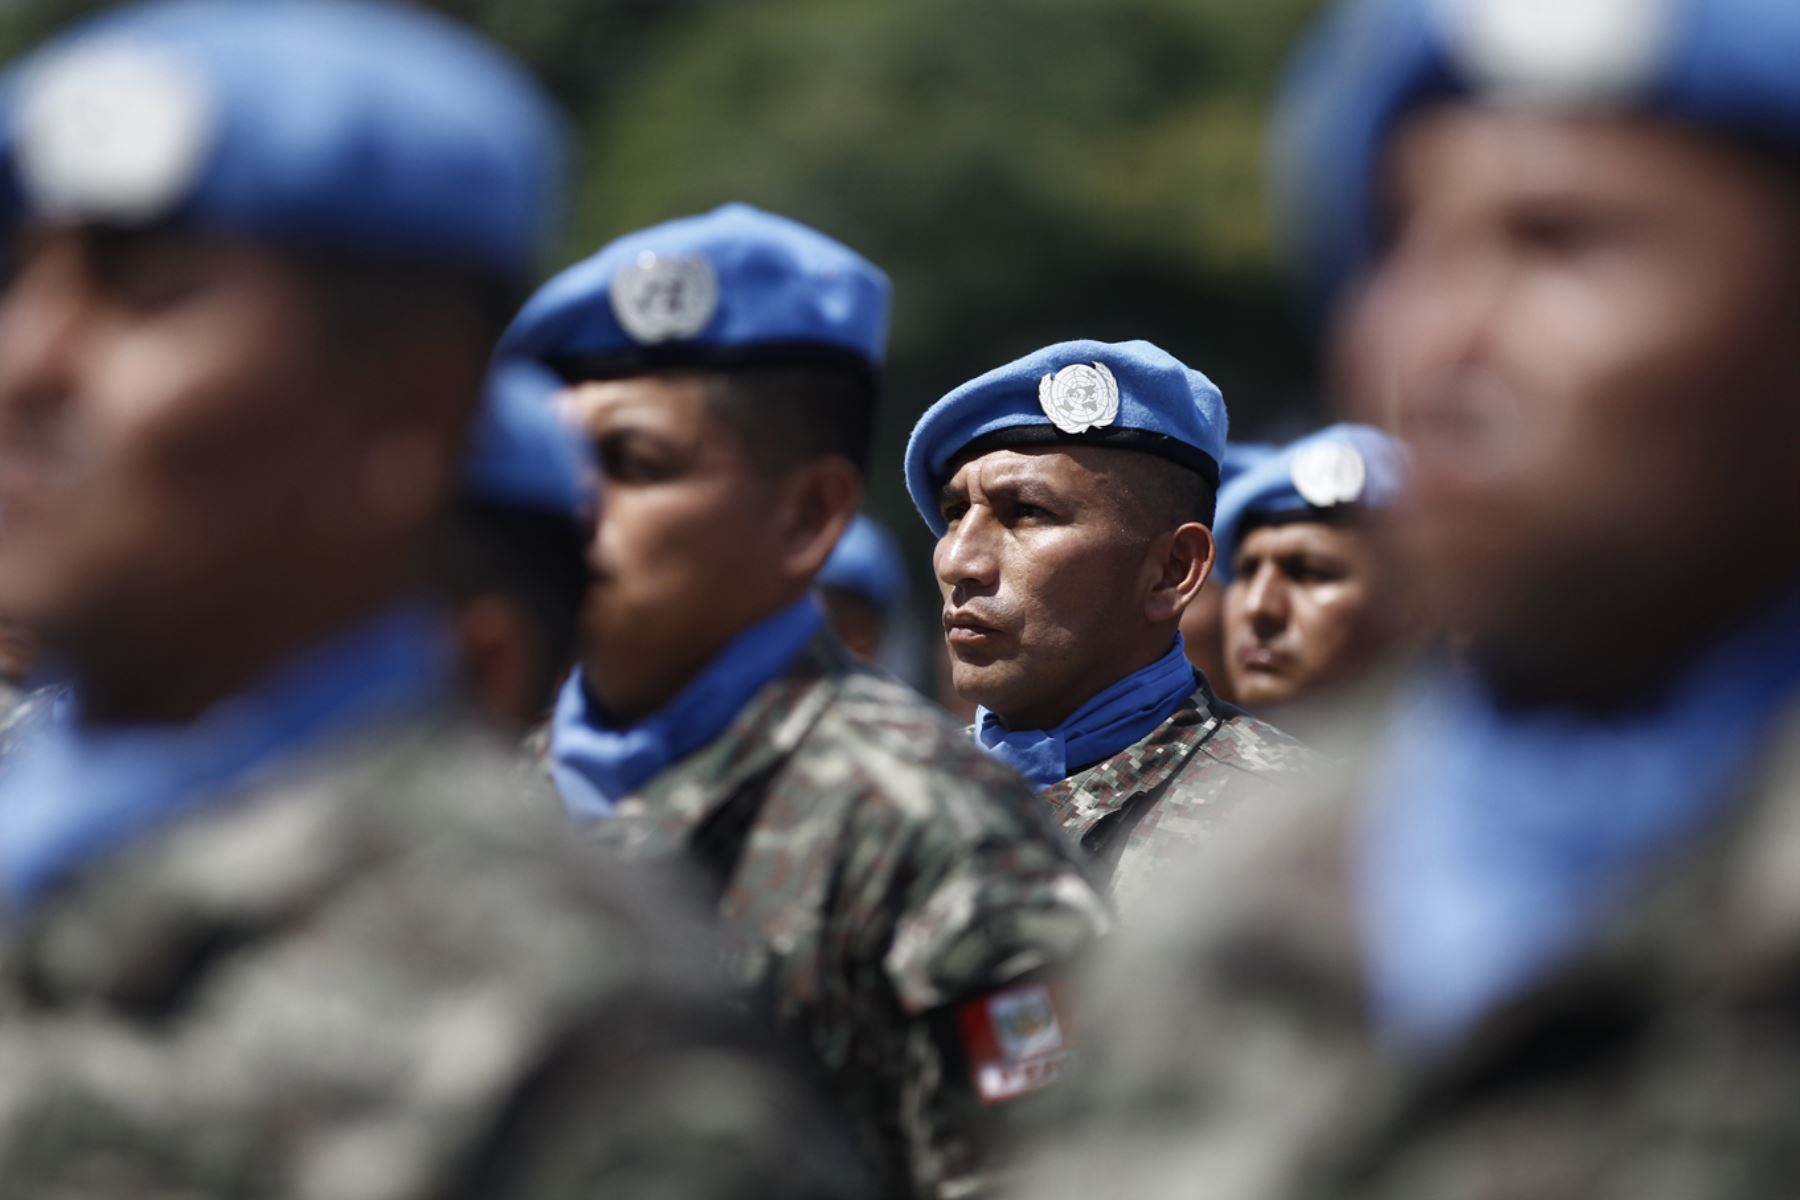 Cascos azules peruanos. ANDINA/Juan Carlos Guzmán